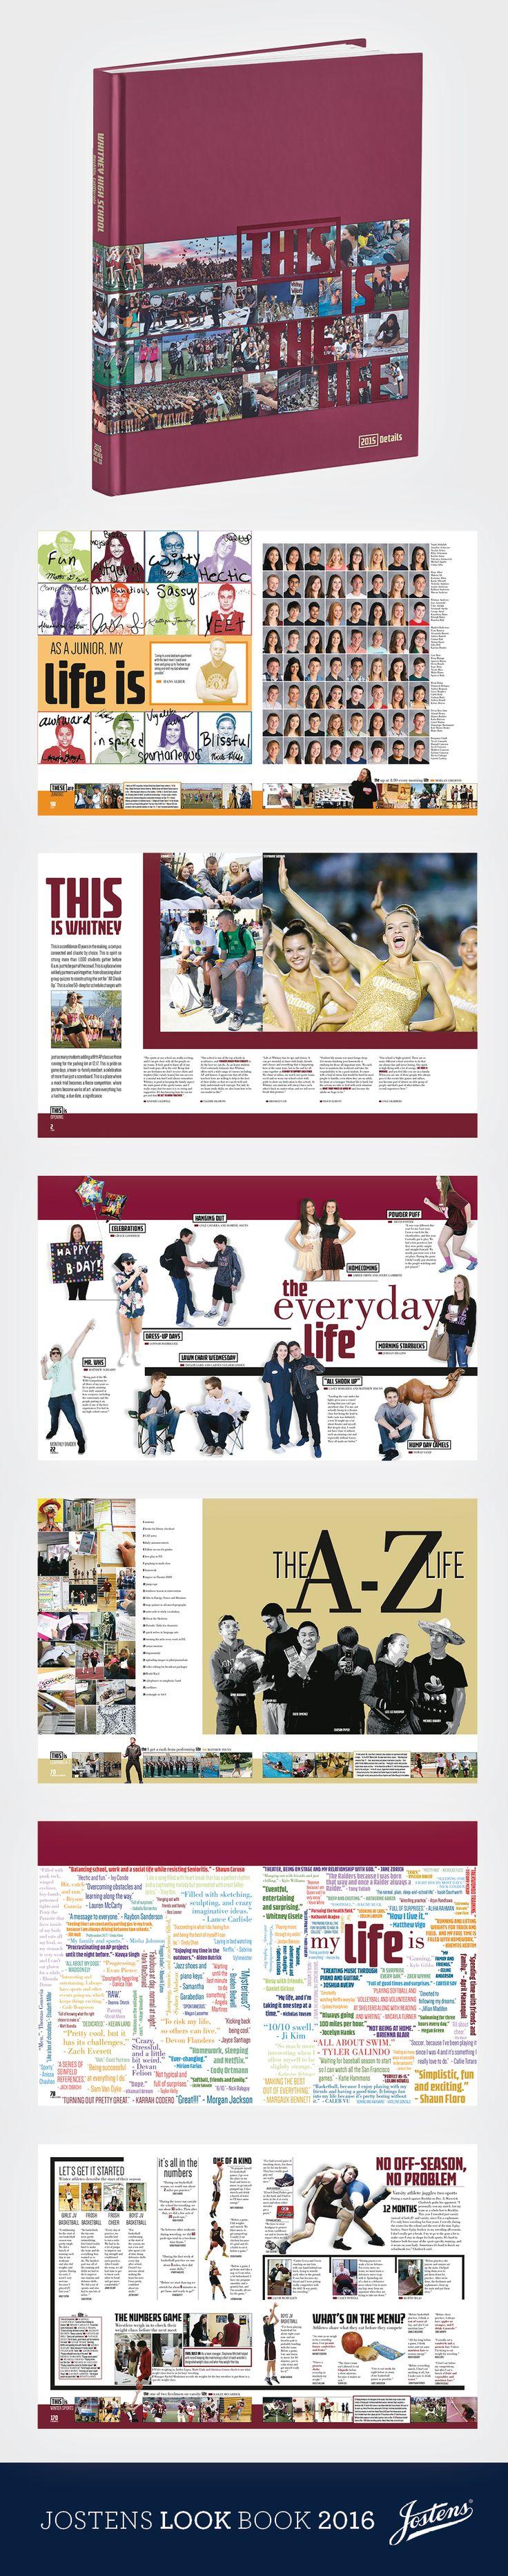 // DETAILS, Whitney High School, Rocklin [CA] #Jostens #LookBook2016 #Ybklove